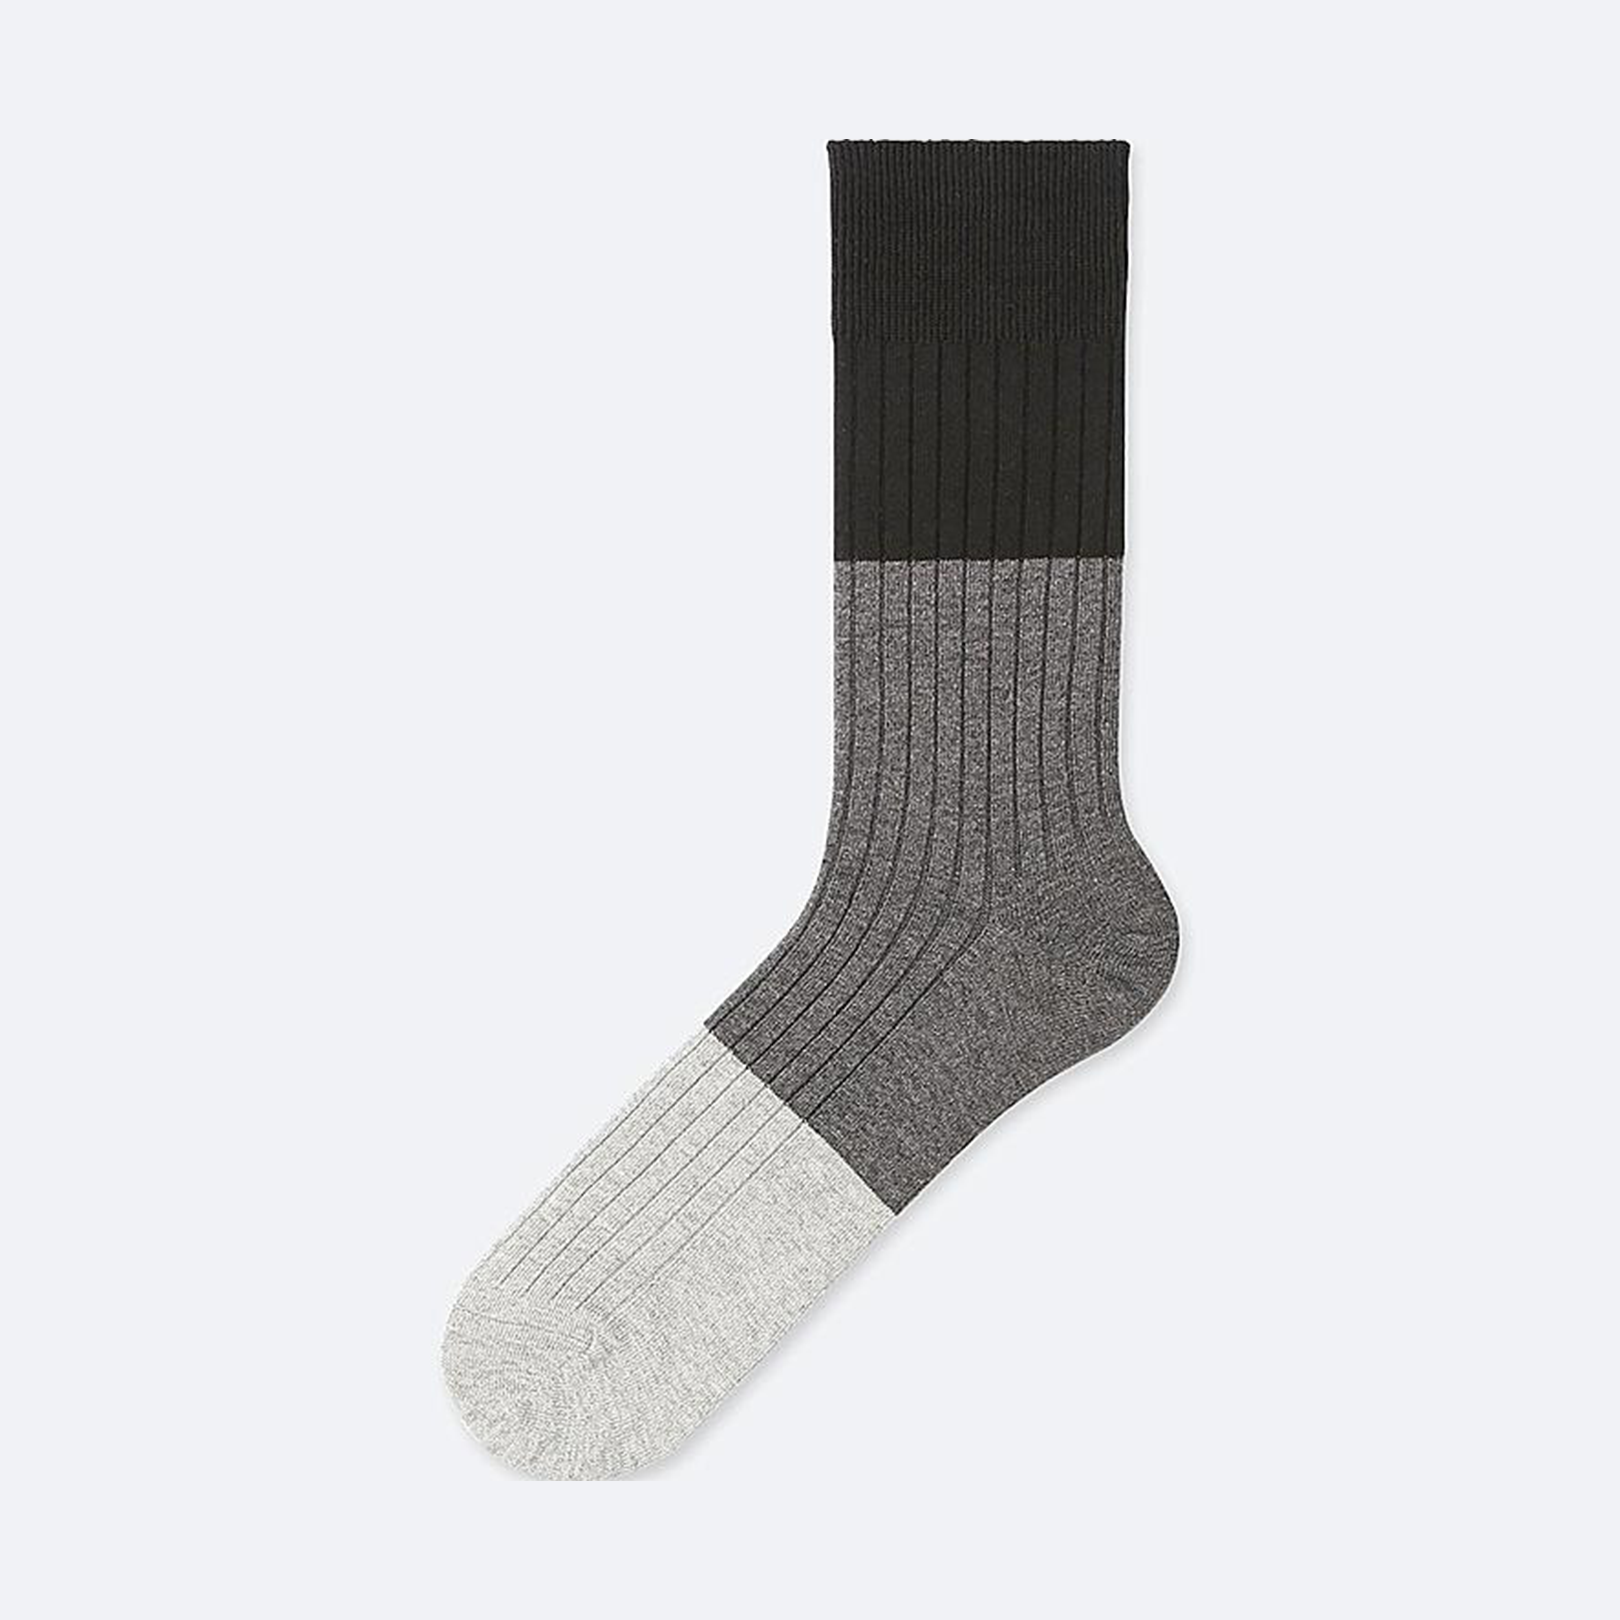 Uniqlo Sock